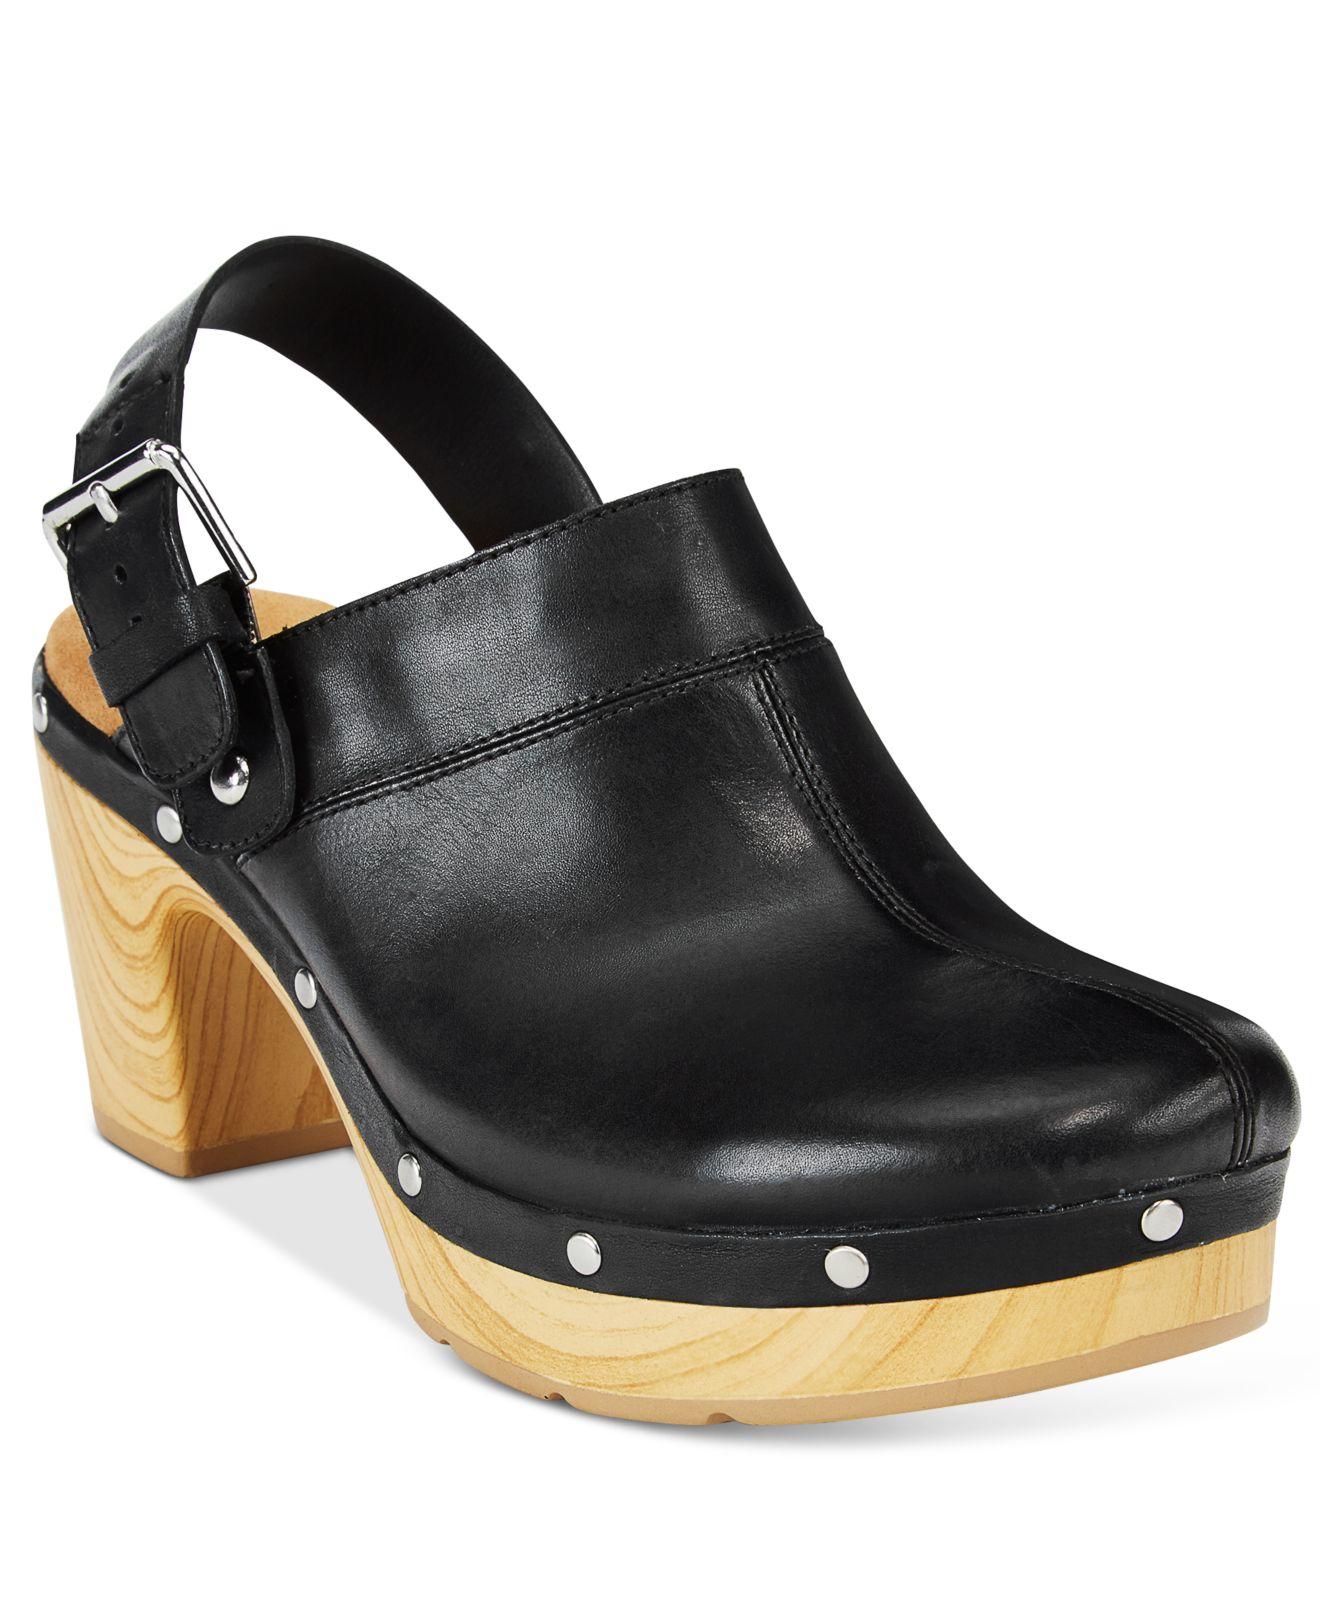 Clarks Black Slingback Shoes